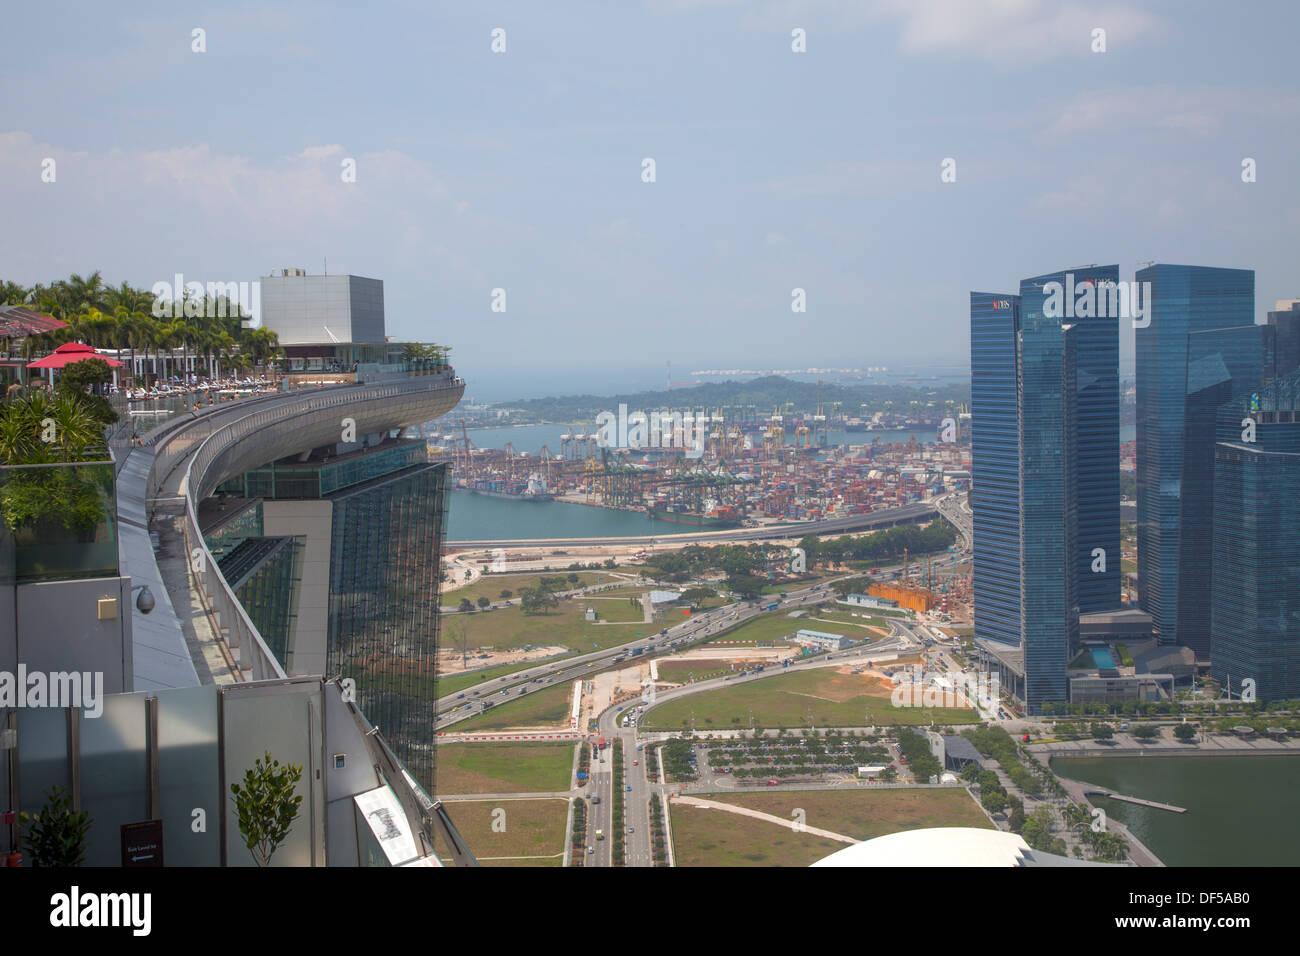 Marina Bay Sands Hotel Roof Pool Singapore Asia Destination View Stock Photo 60968852 Alamy